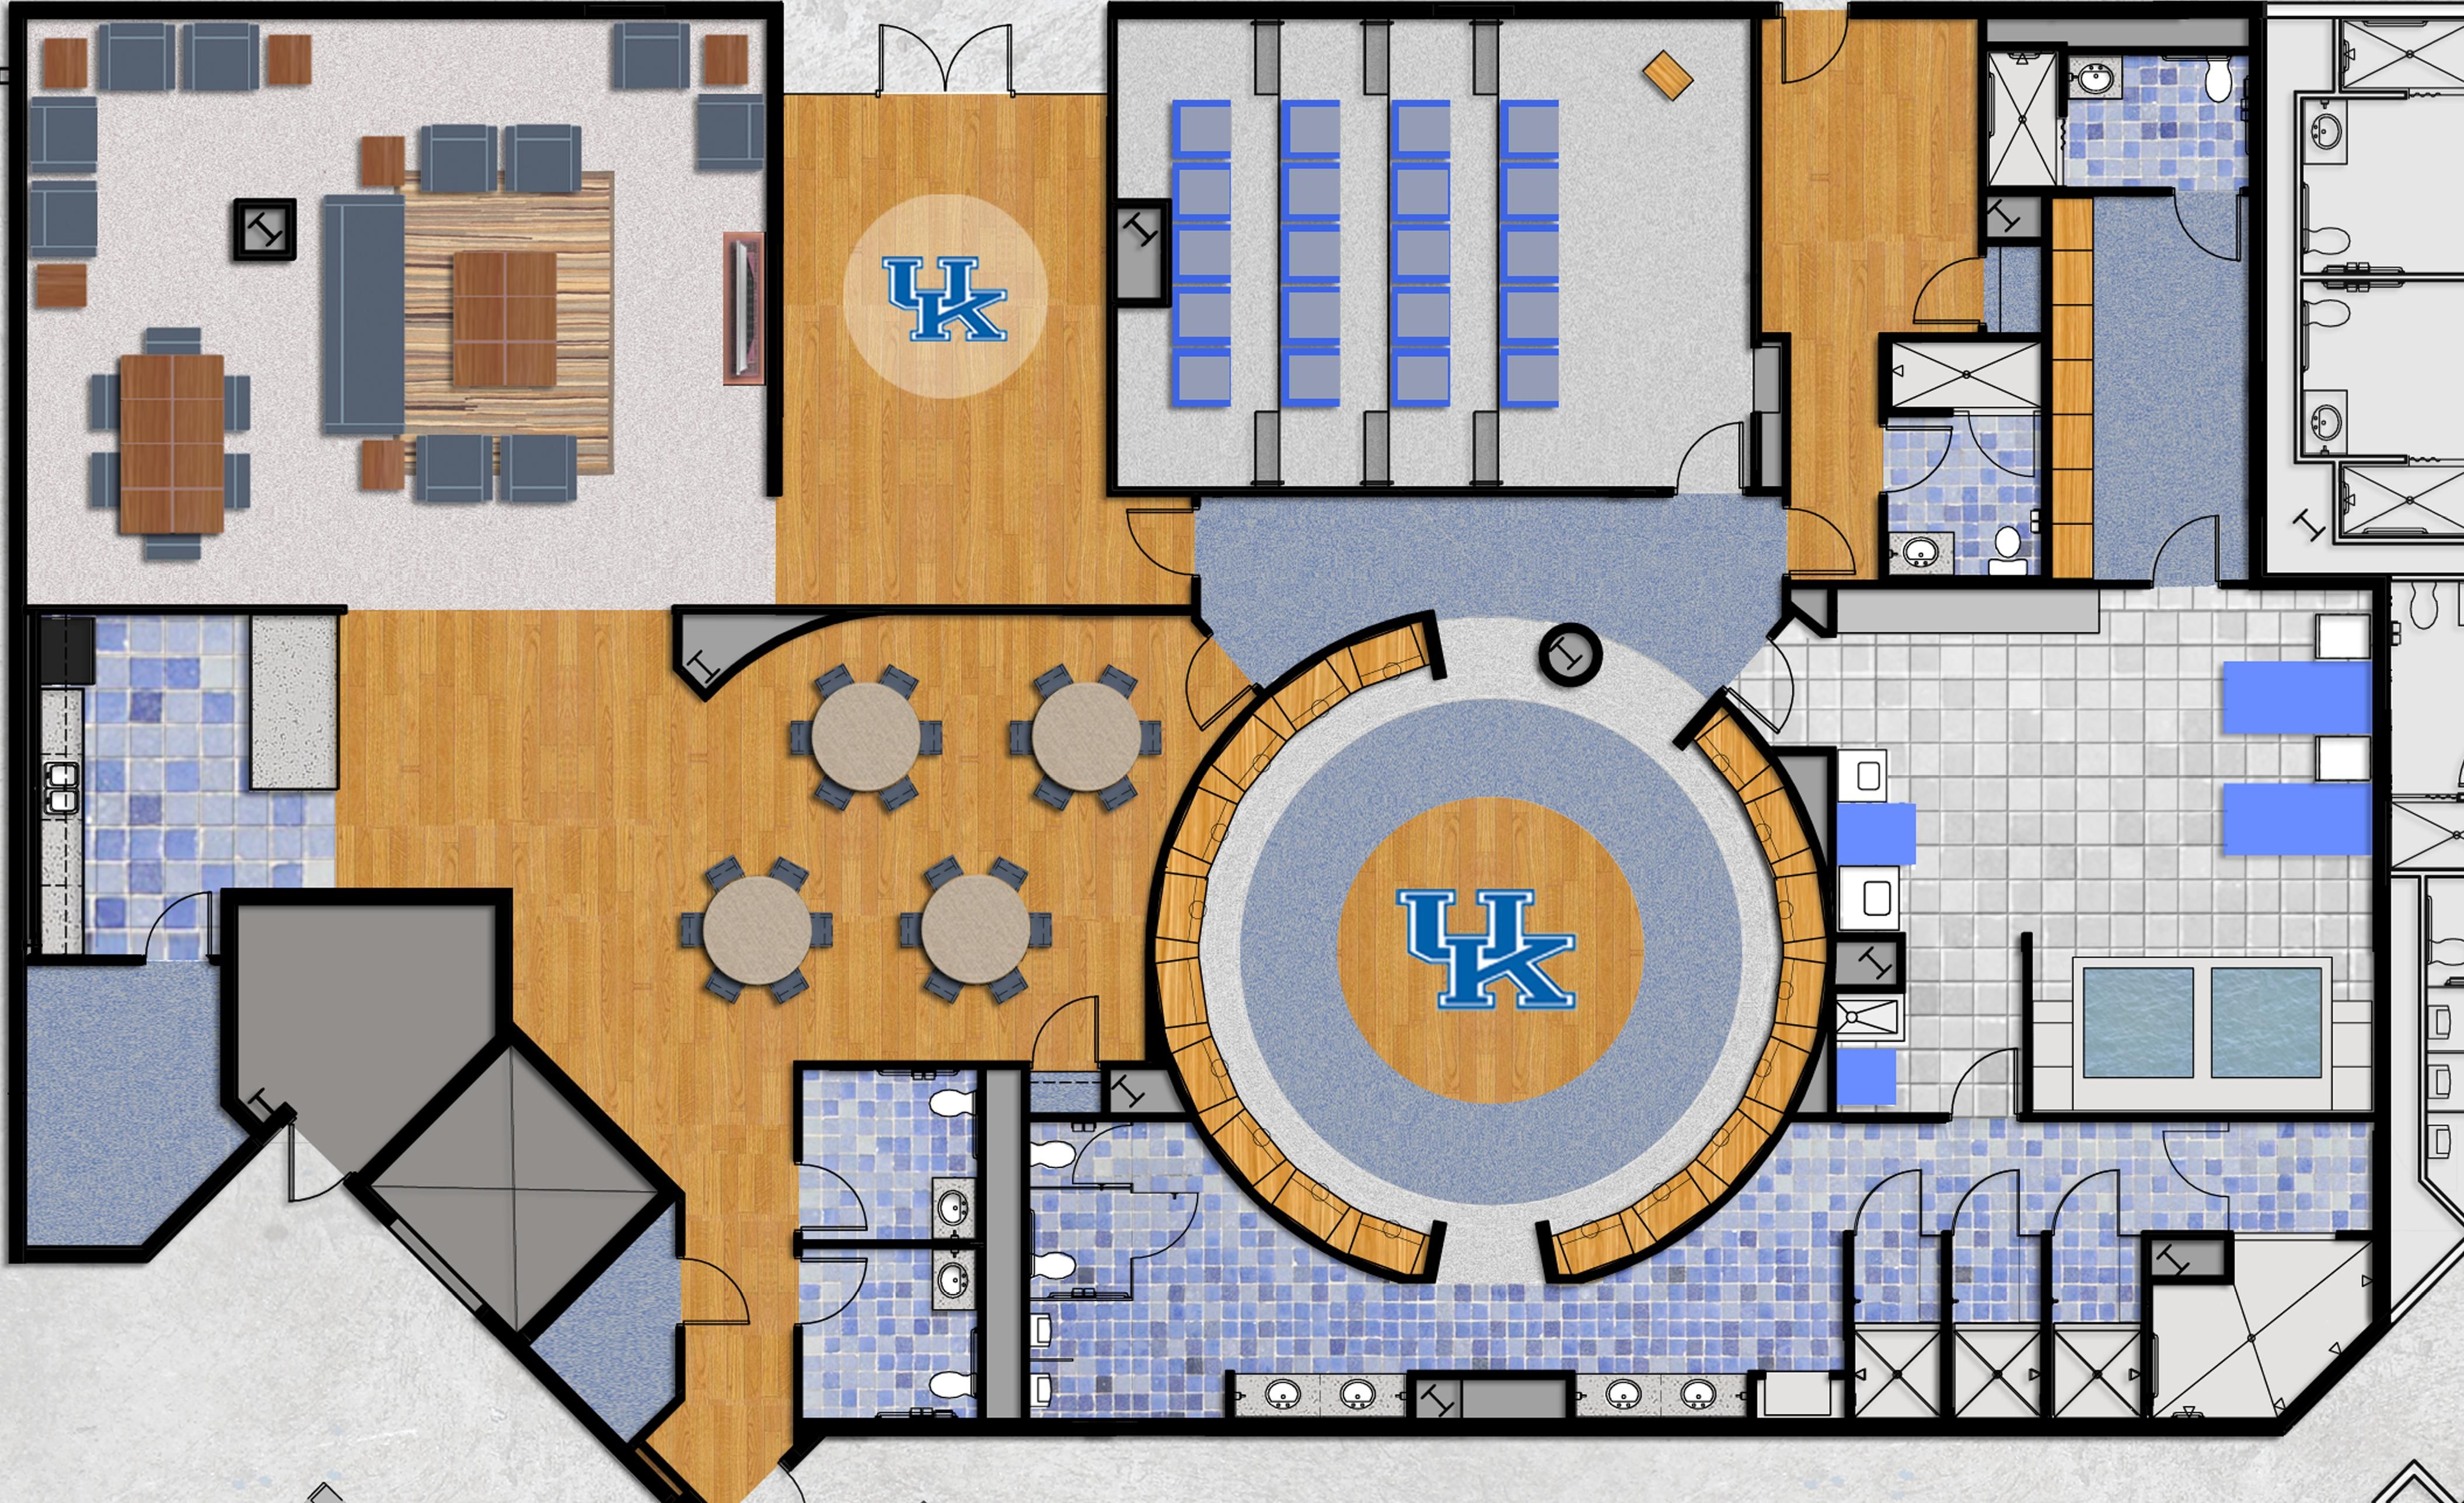 staff locker room dimensions - Google Search | Commercial II ...